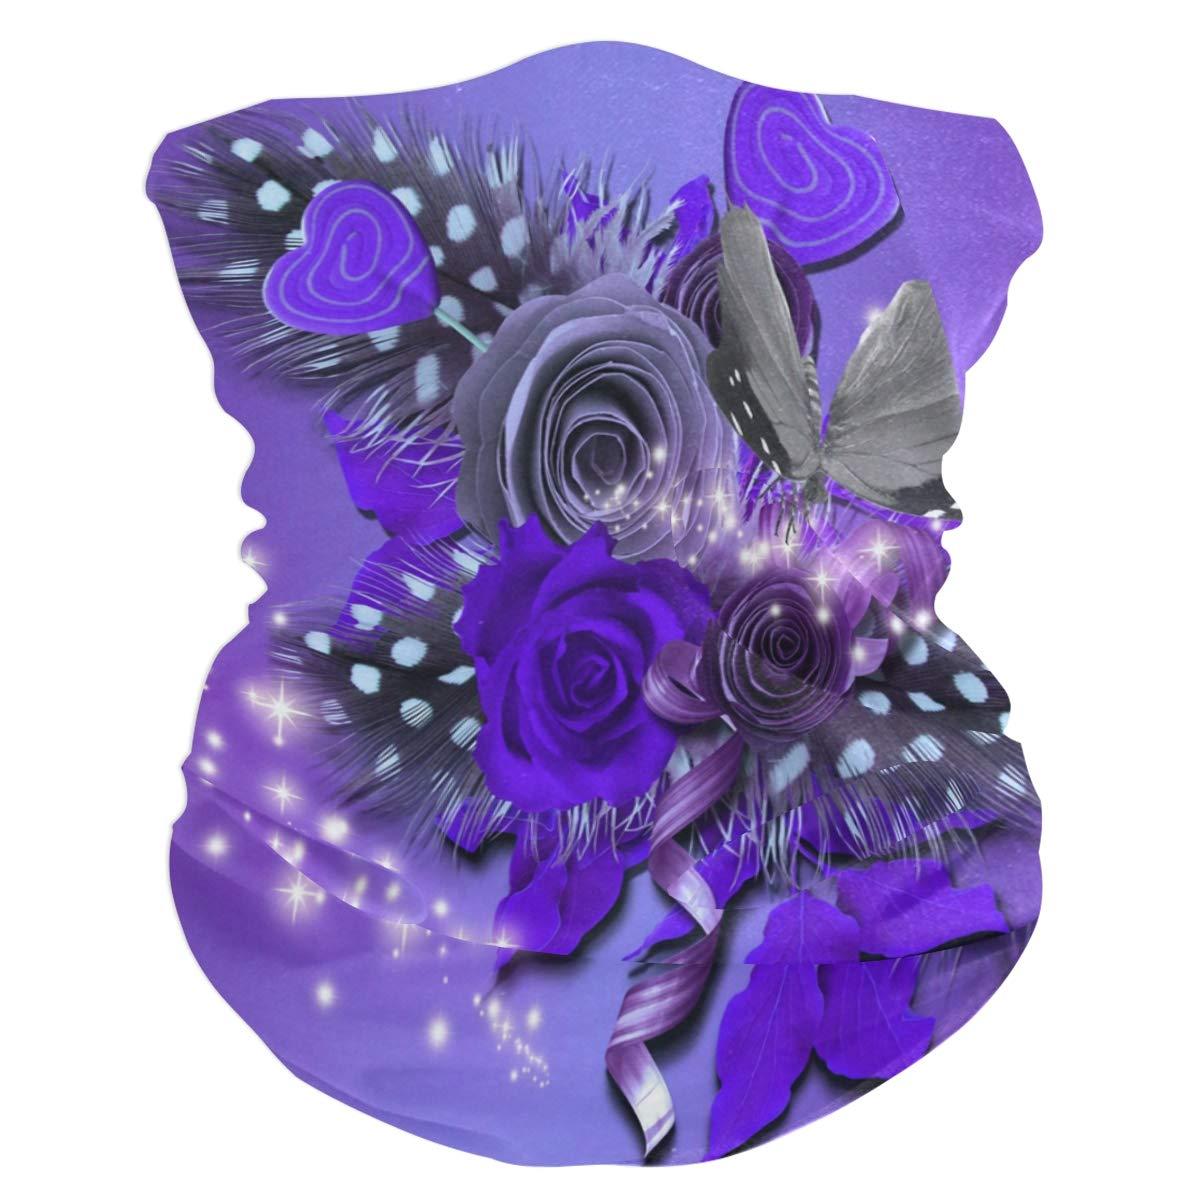 Abstract Flower Headband...